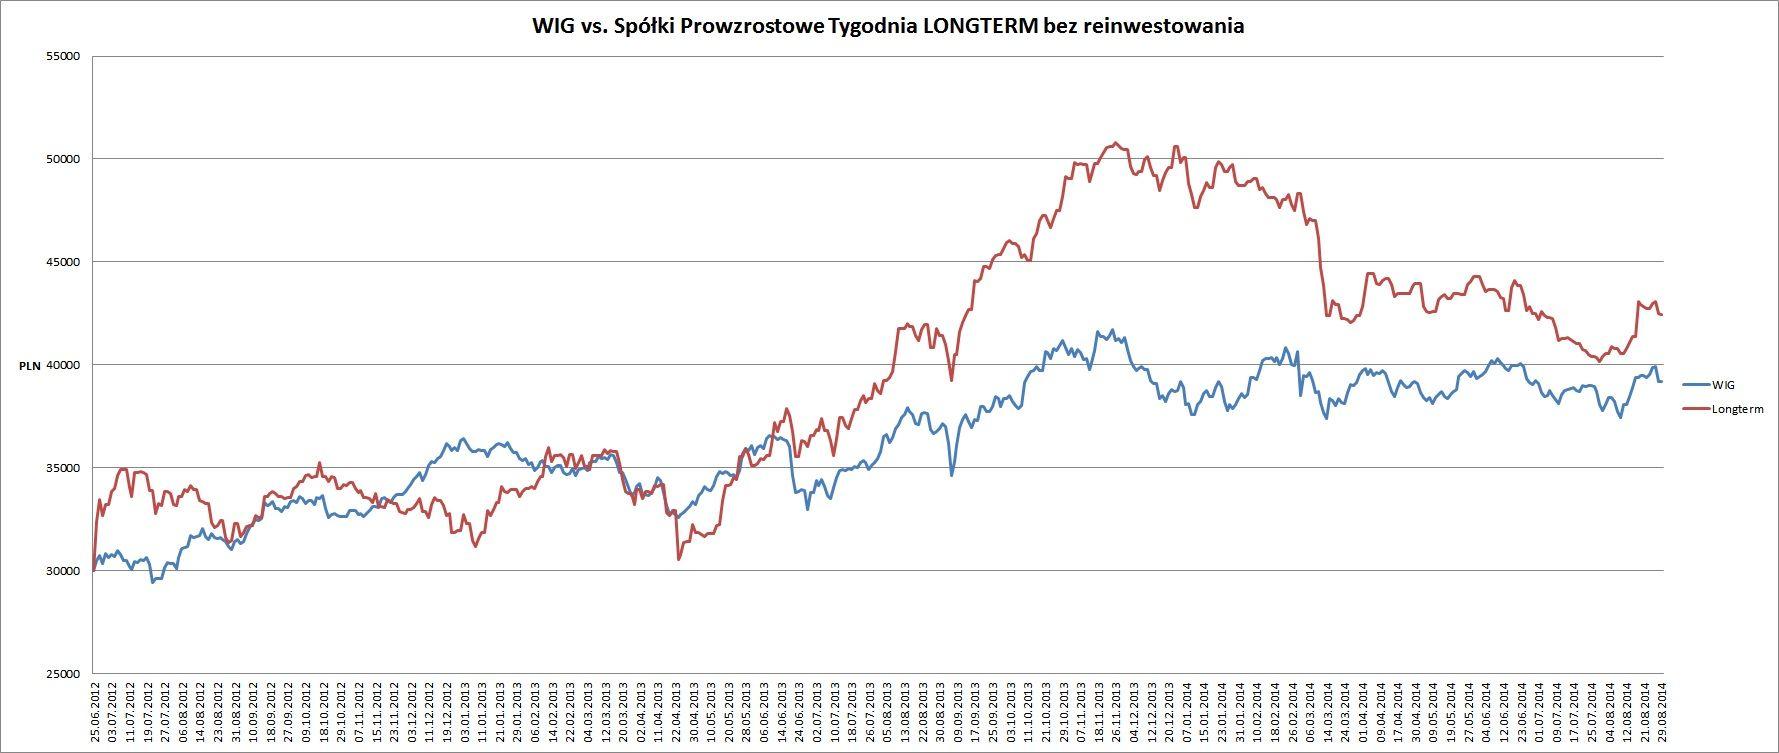 long vs wig od pocz. 2012 4